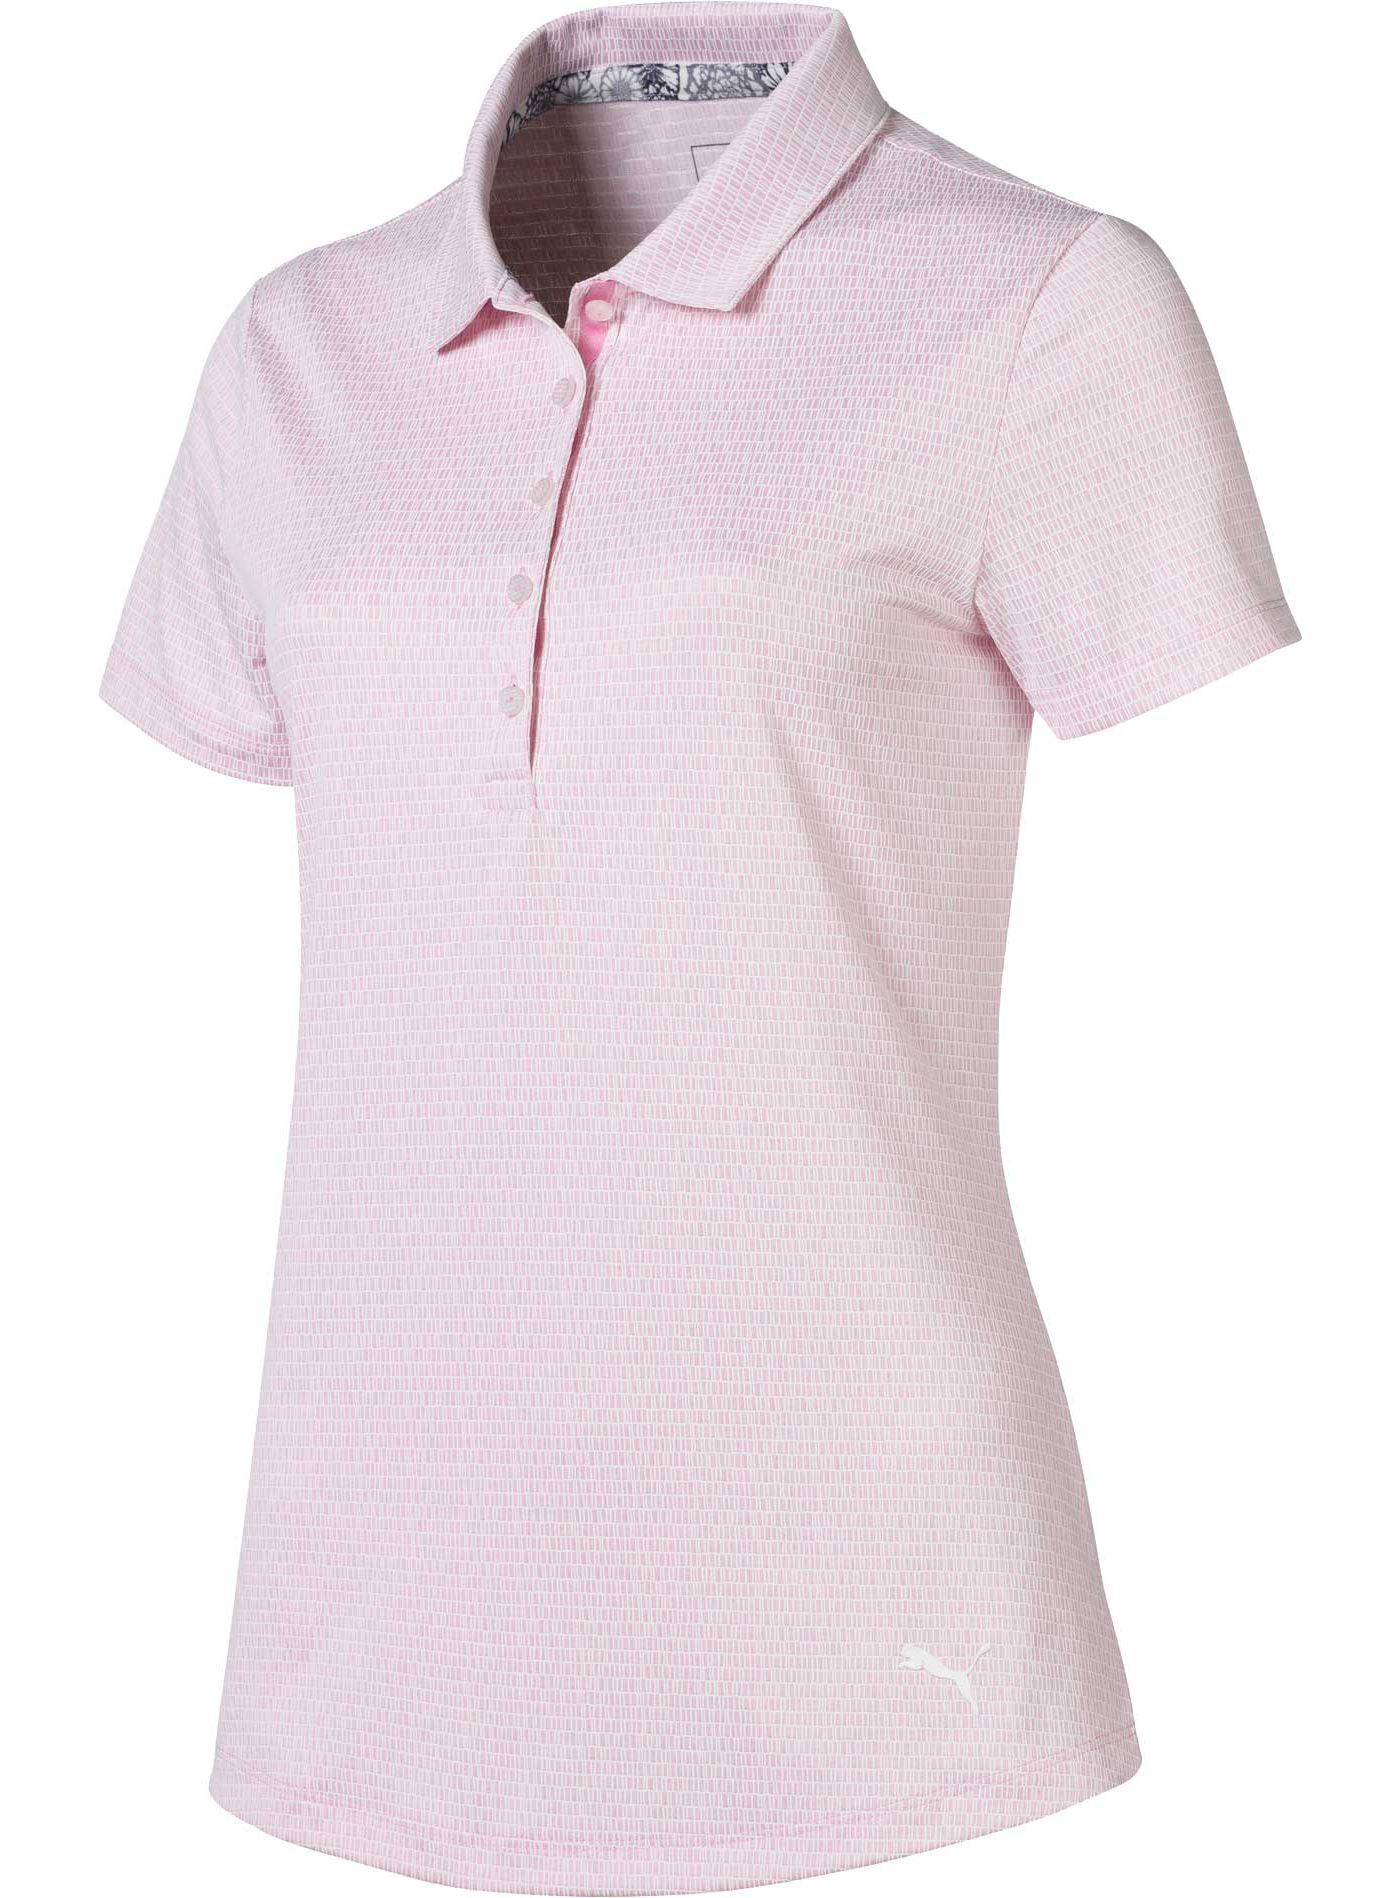 PUMA Women's Swift Golf Polo